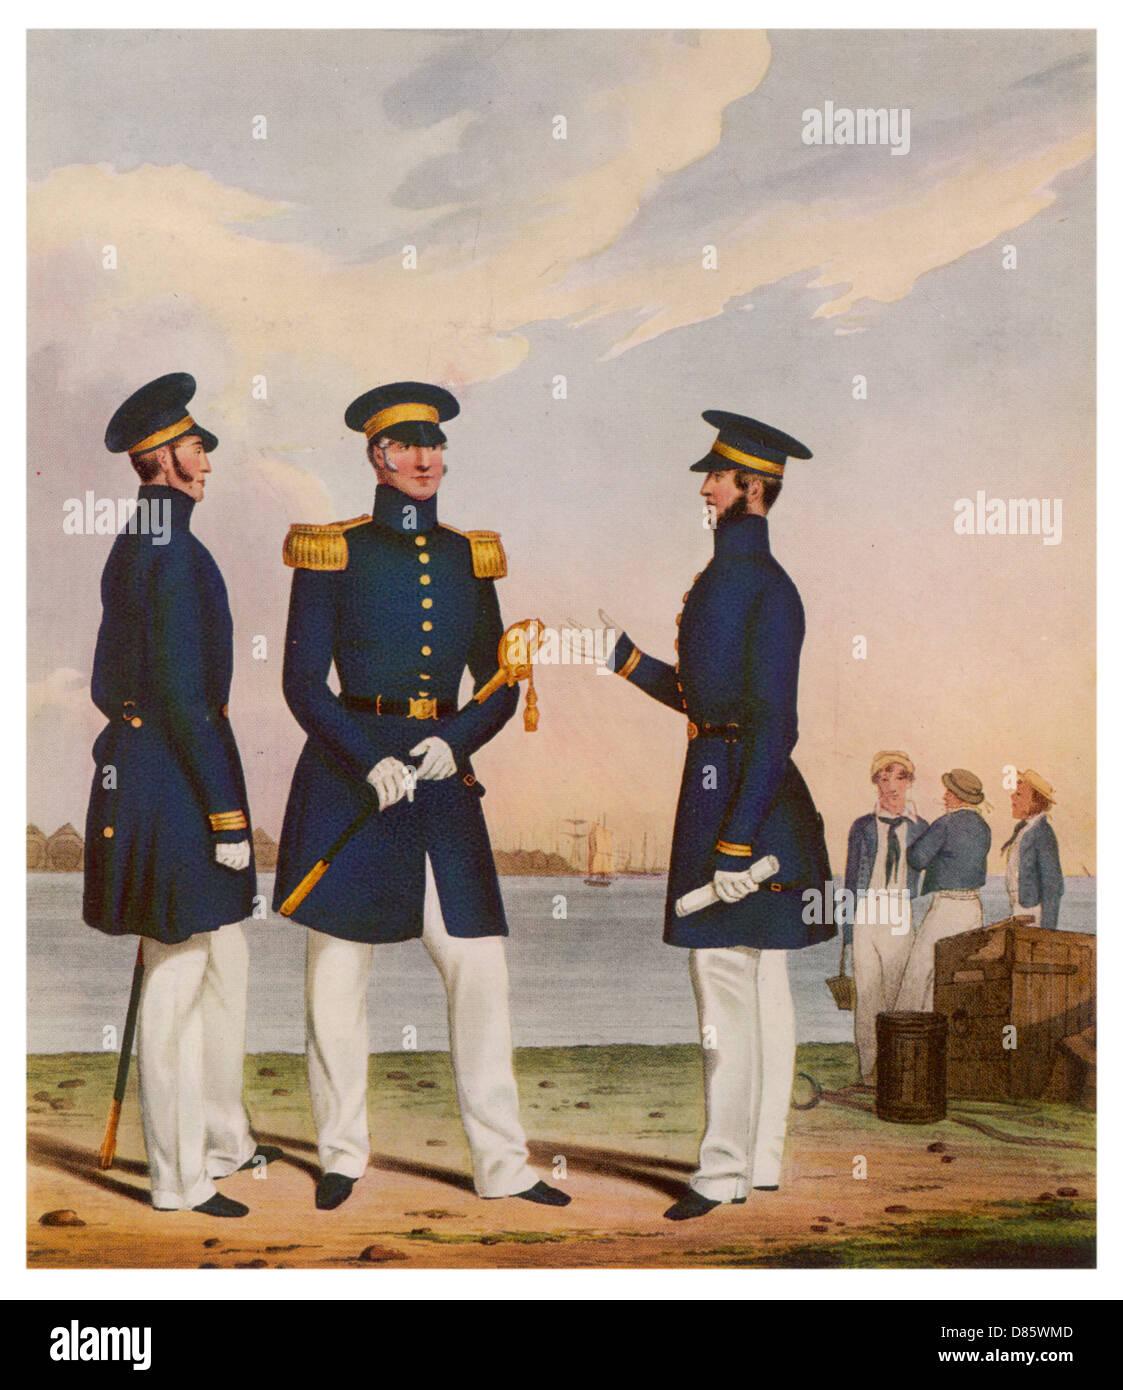 https://i2.wp.com/c8.alamy.com/comp/D85WMD/19th-century-naval-officers-D85WMD.jpg